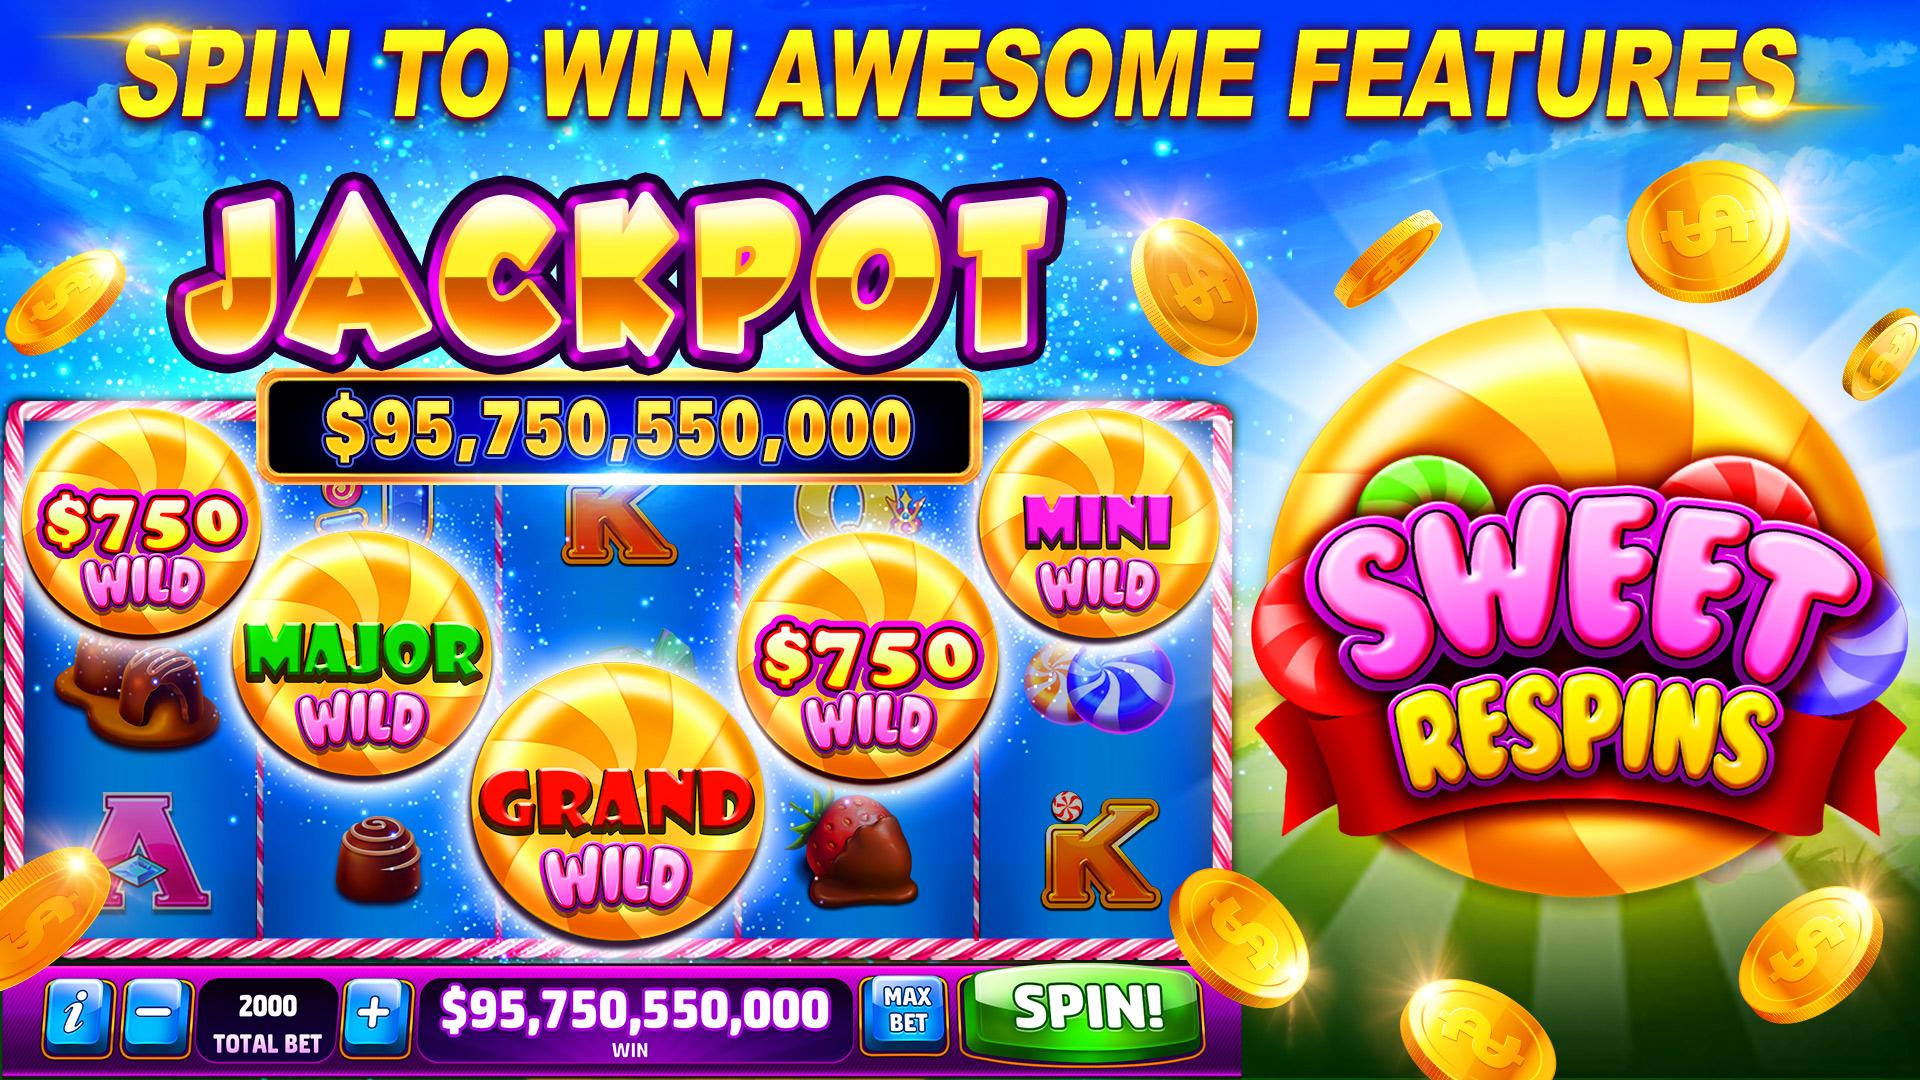 Enviar dinero casino de forma segura promotions daily updated - 87626